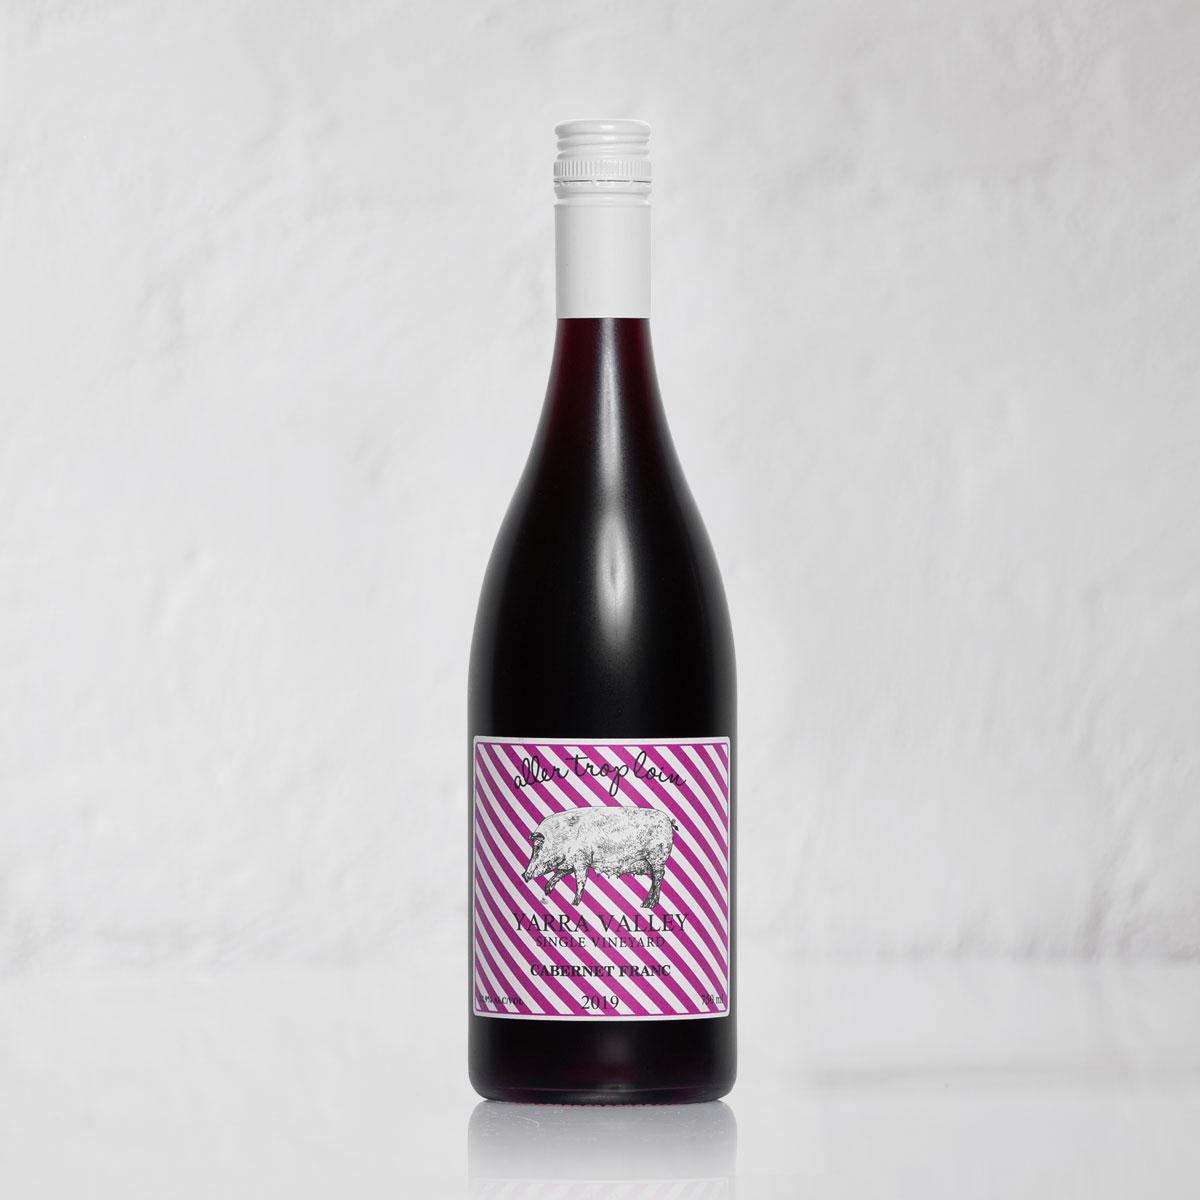 ATL Cabernet Franc Wine